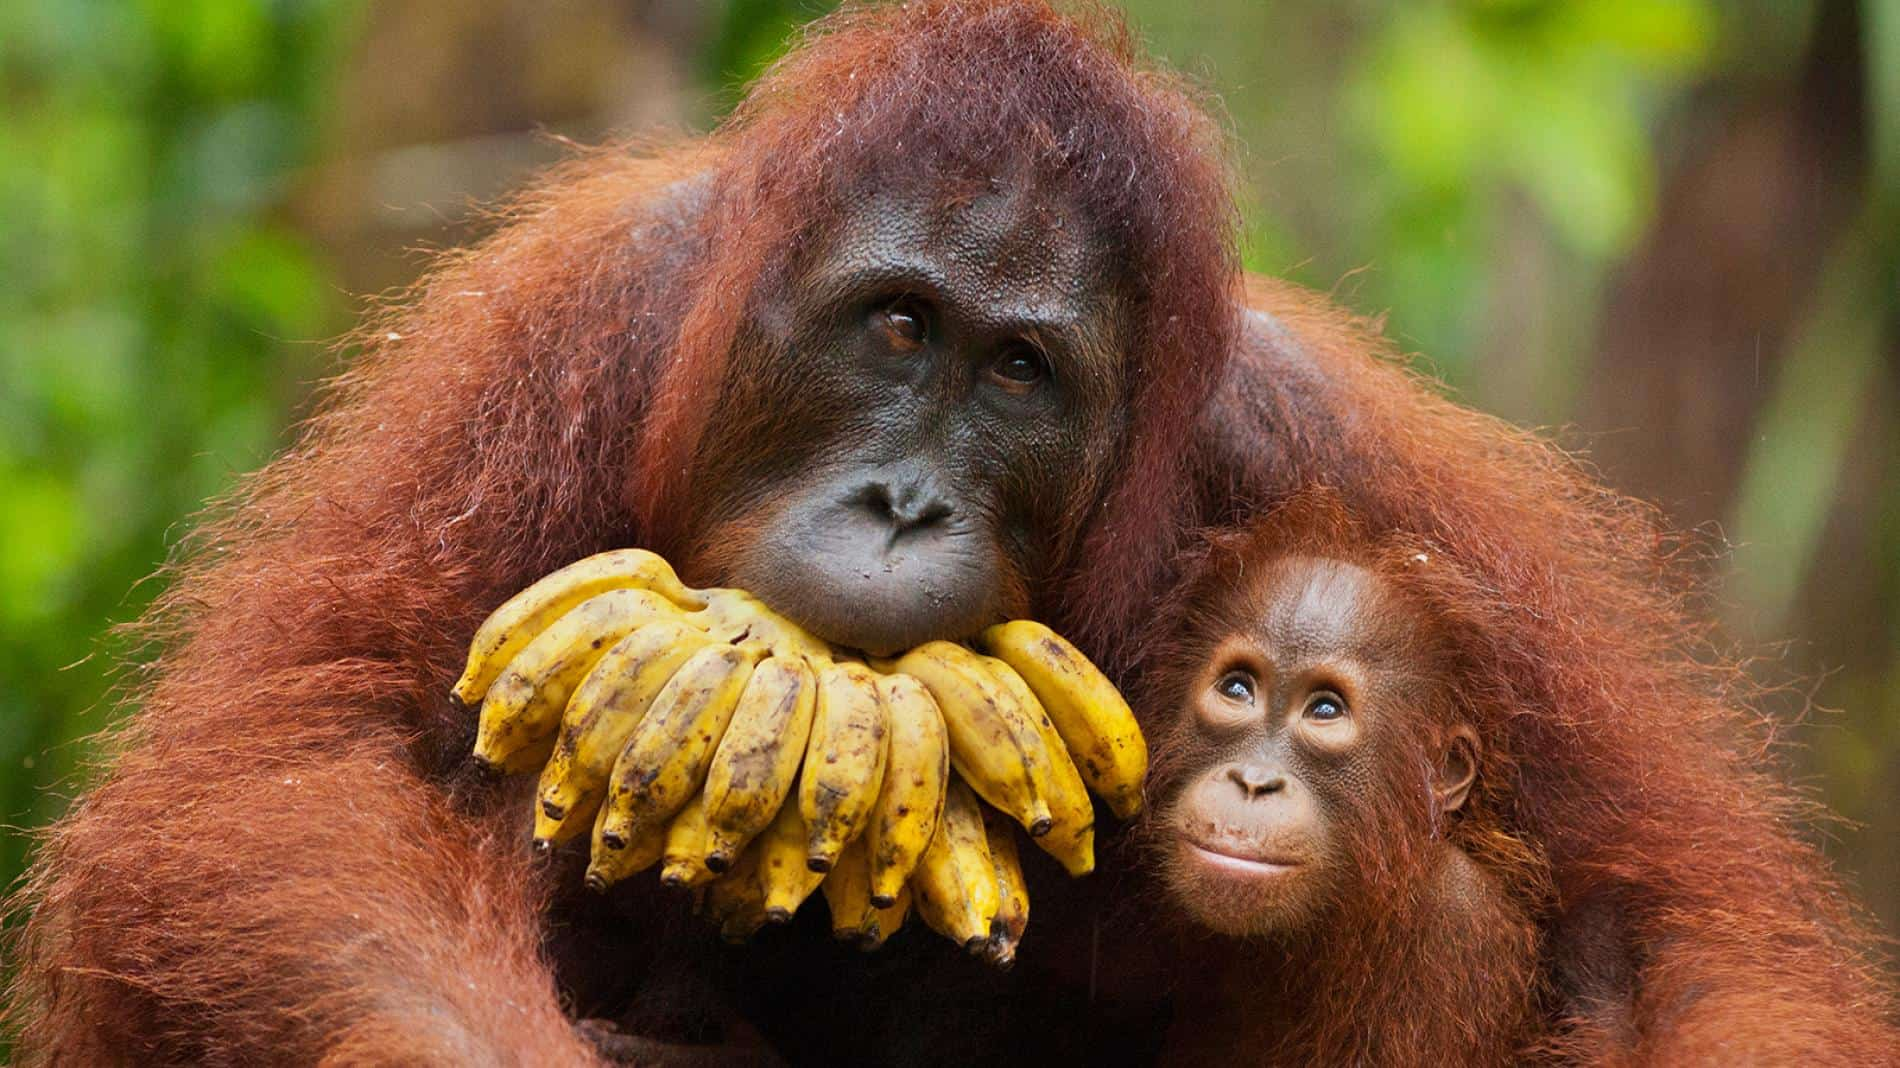 Orangutan Facts Worksheets Habitat Anatomy And Life